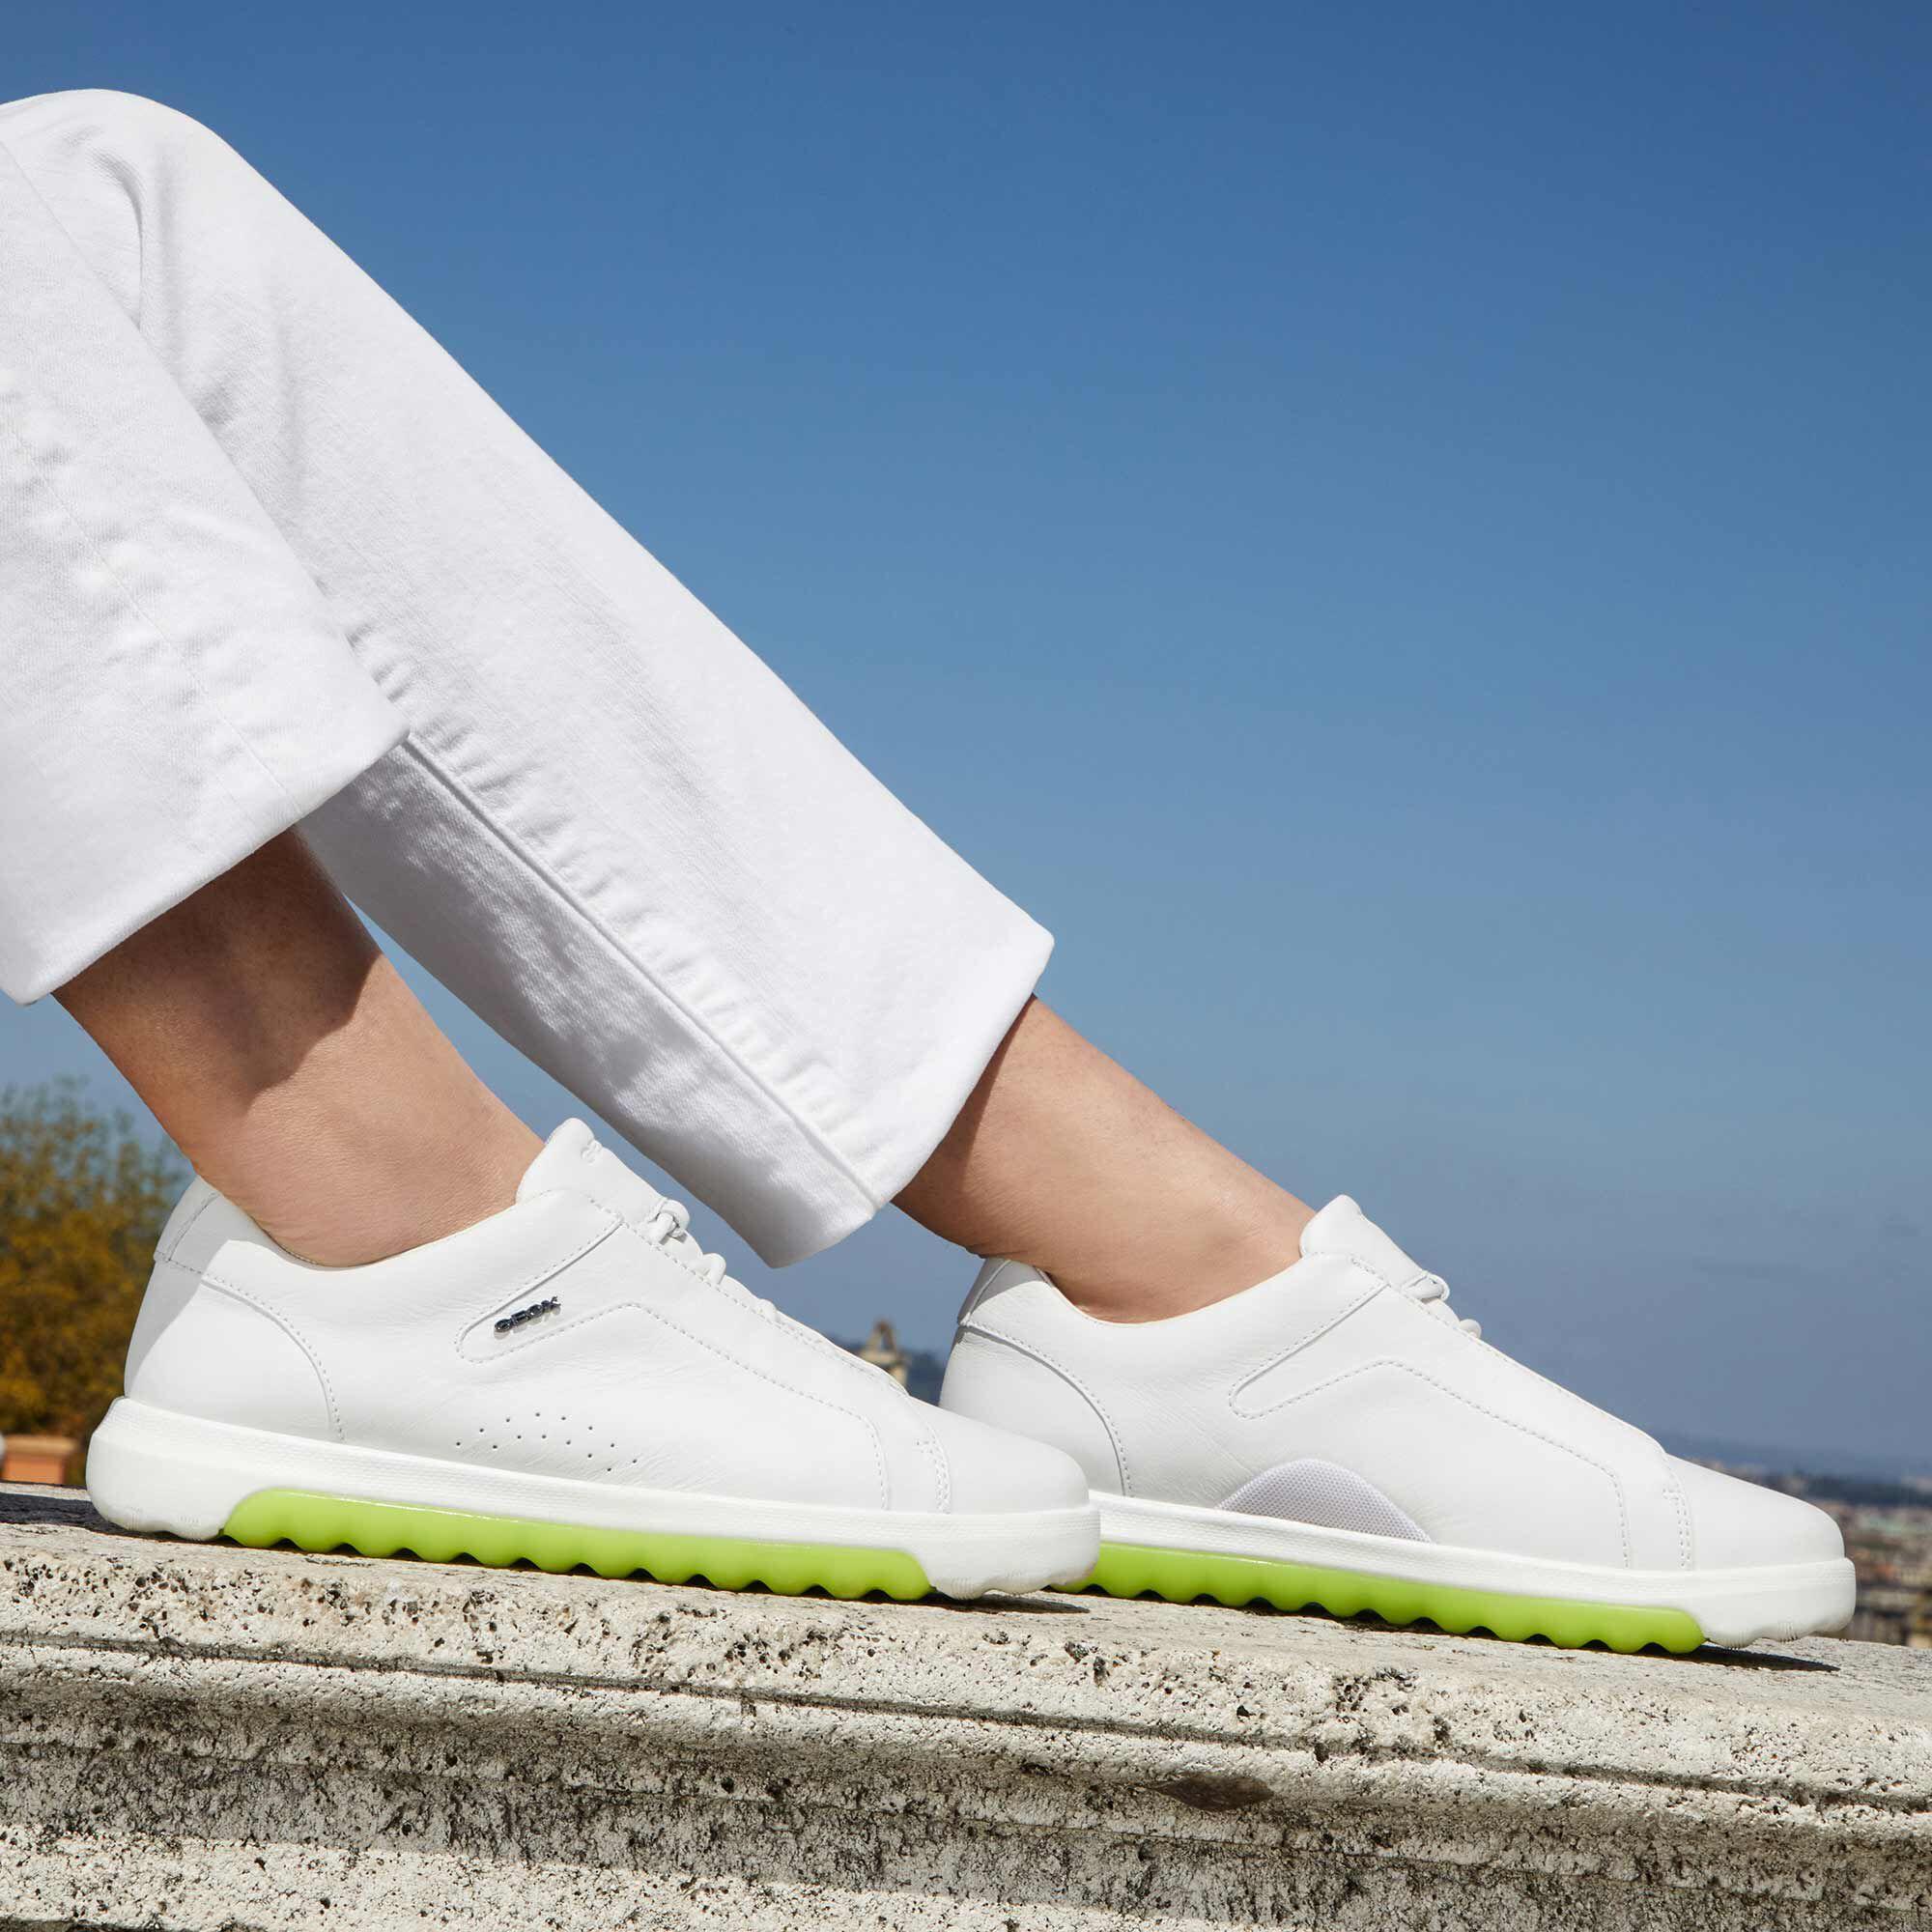 Geox NEXSIDE Woman White Sneakers | Geox FW1920